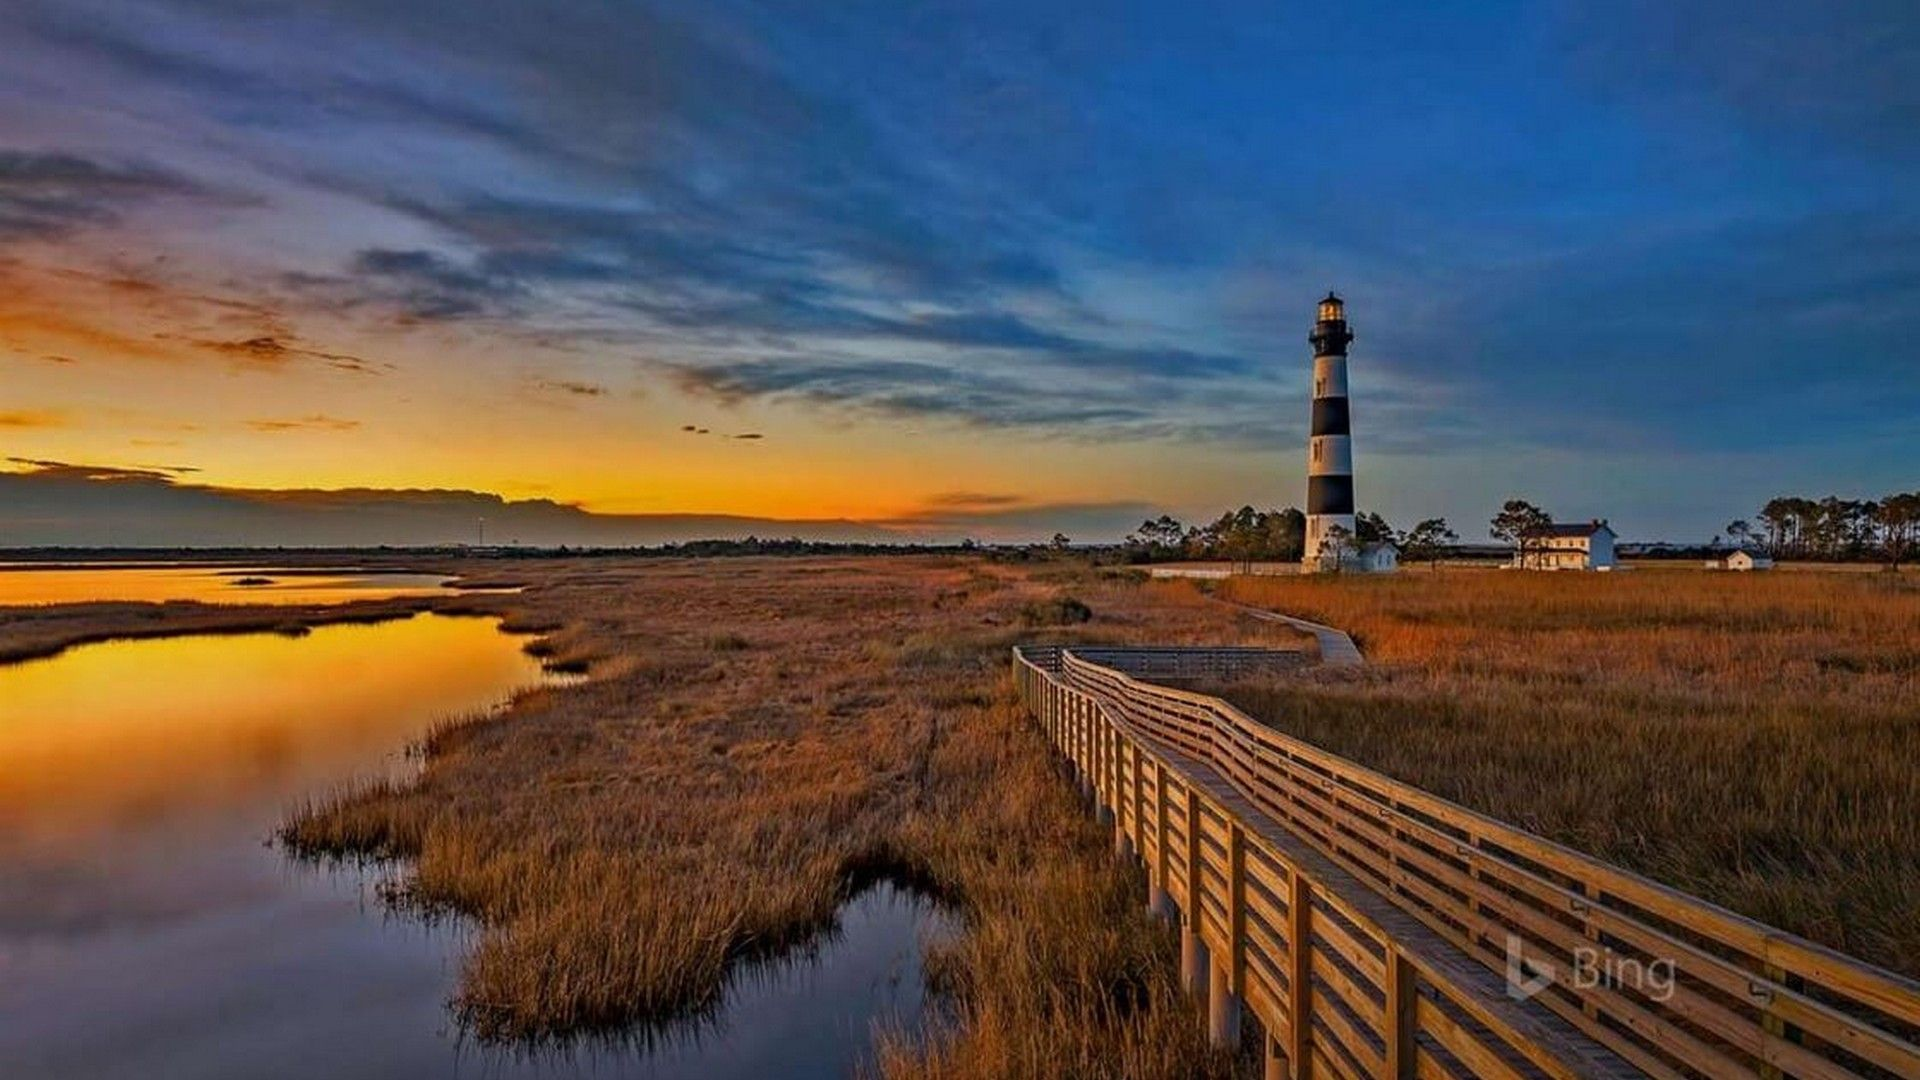 Best Windows 10 Wallpaper Bodie Island Lighthouse Lighthouse